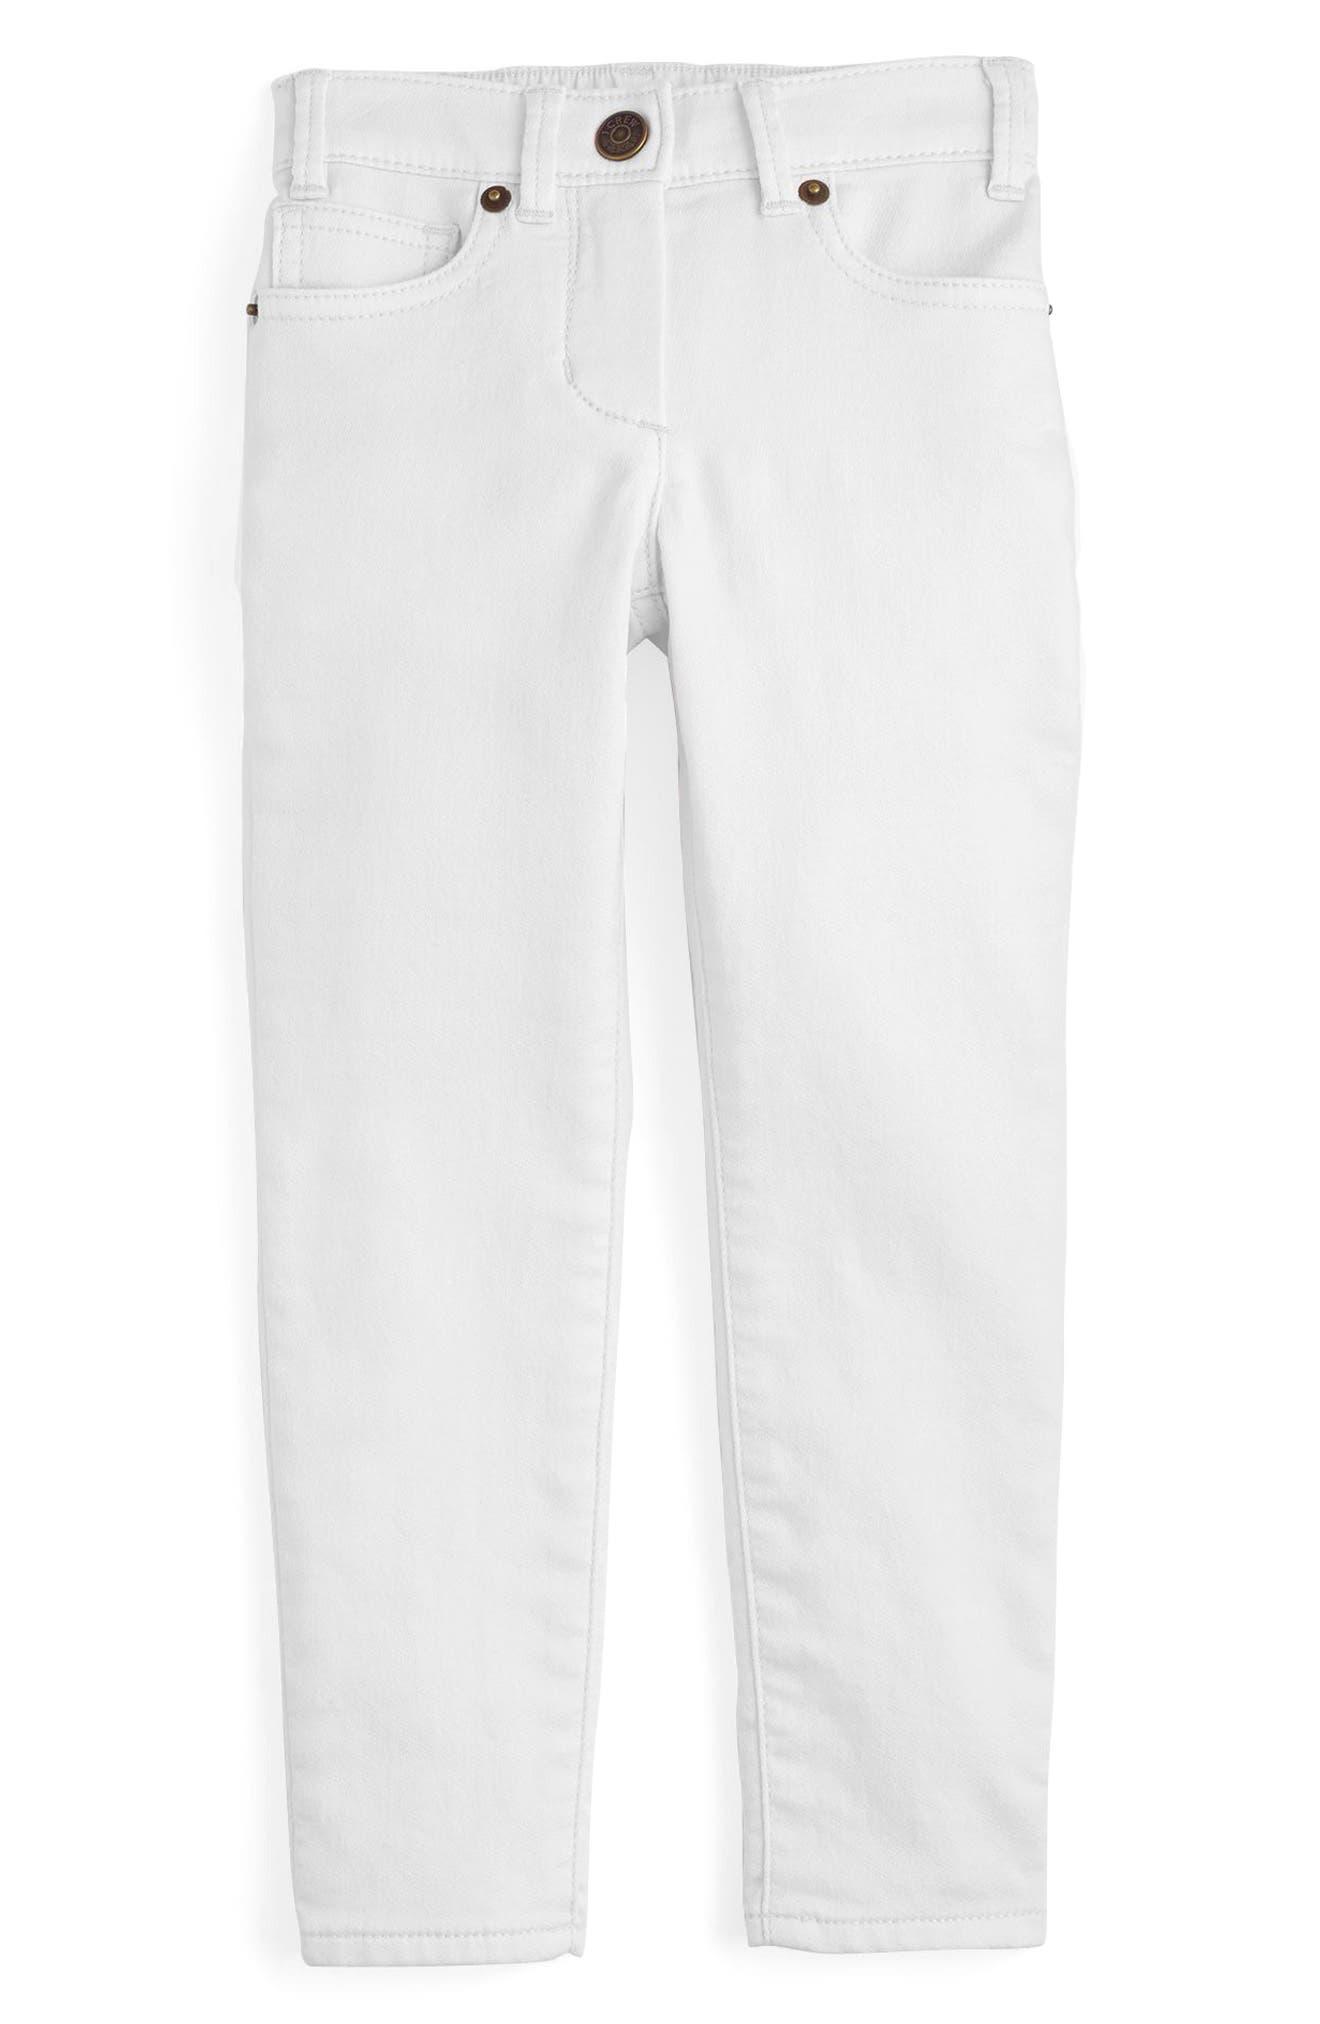 Runaround Garment Dye Jeans,                         Main,                         color, White